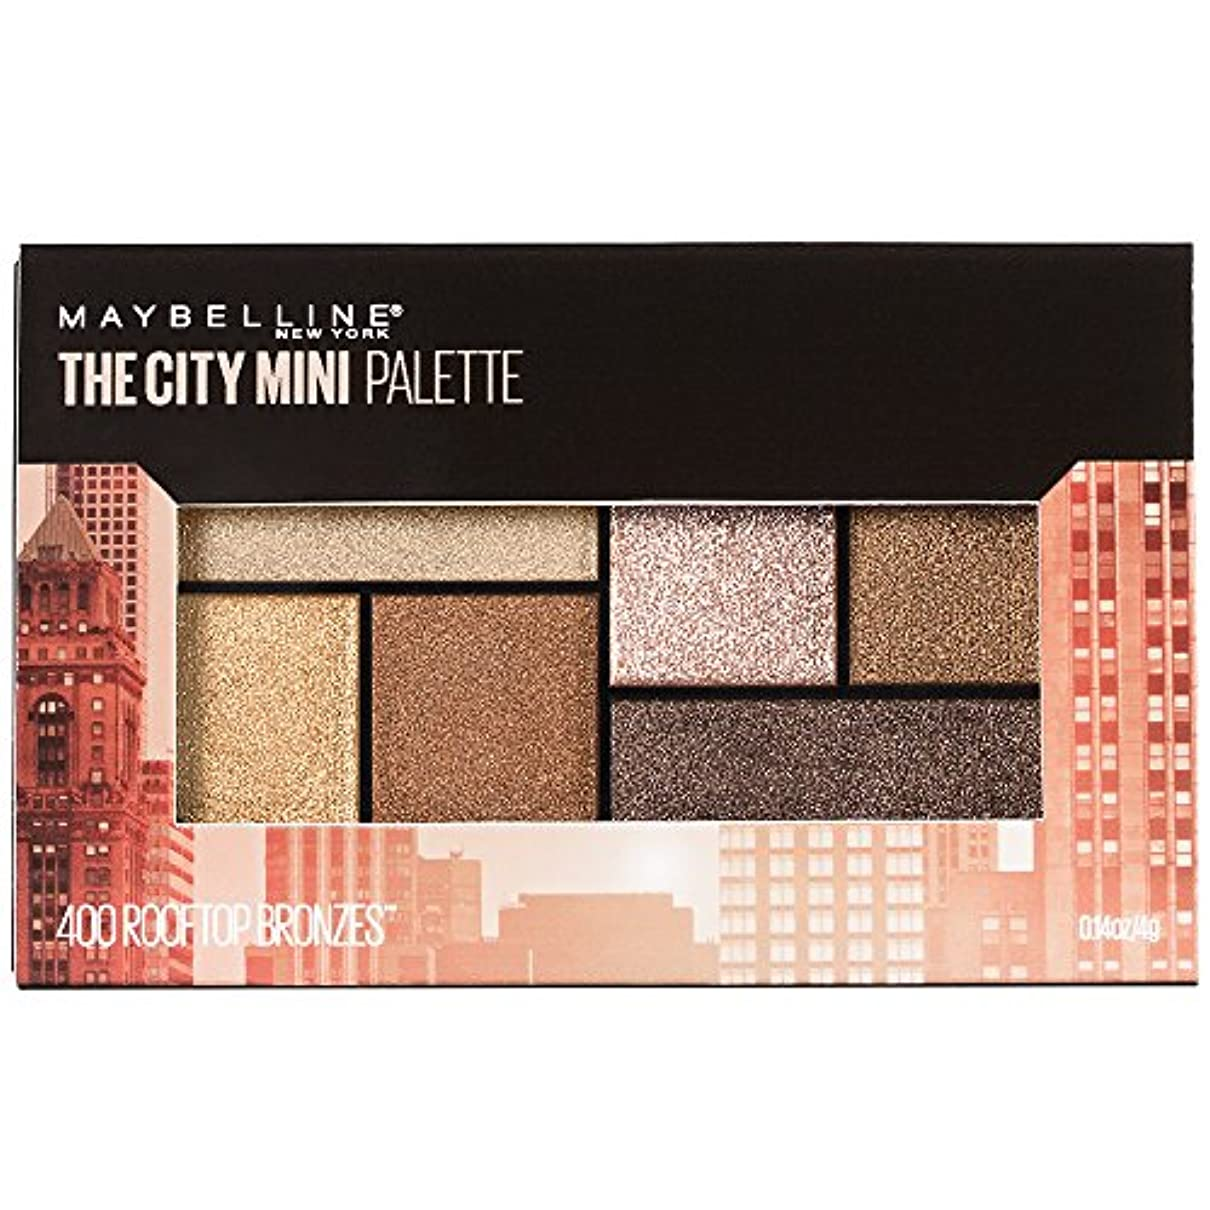 偉業人事太平洋諸島MAYBELLINE The City Mini Palette - Rooftop Bronzes (並行輸入品)